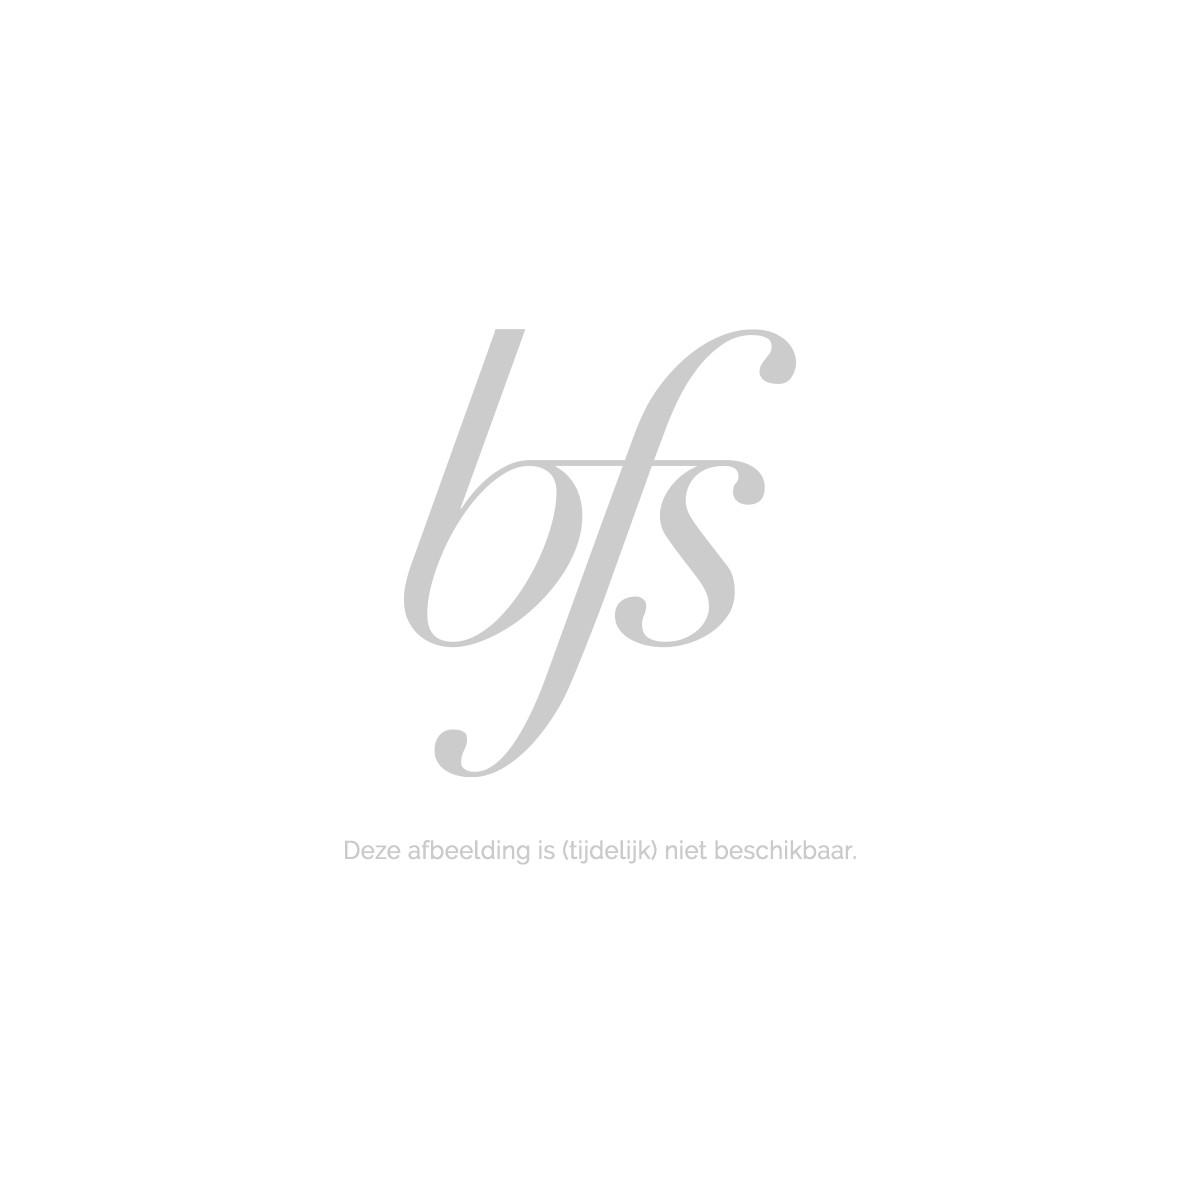 Afbeelding van Anastasia 5 Pieces Kit Blonde Wenkbrauw Make up